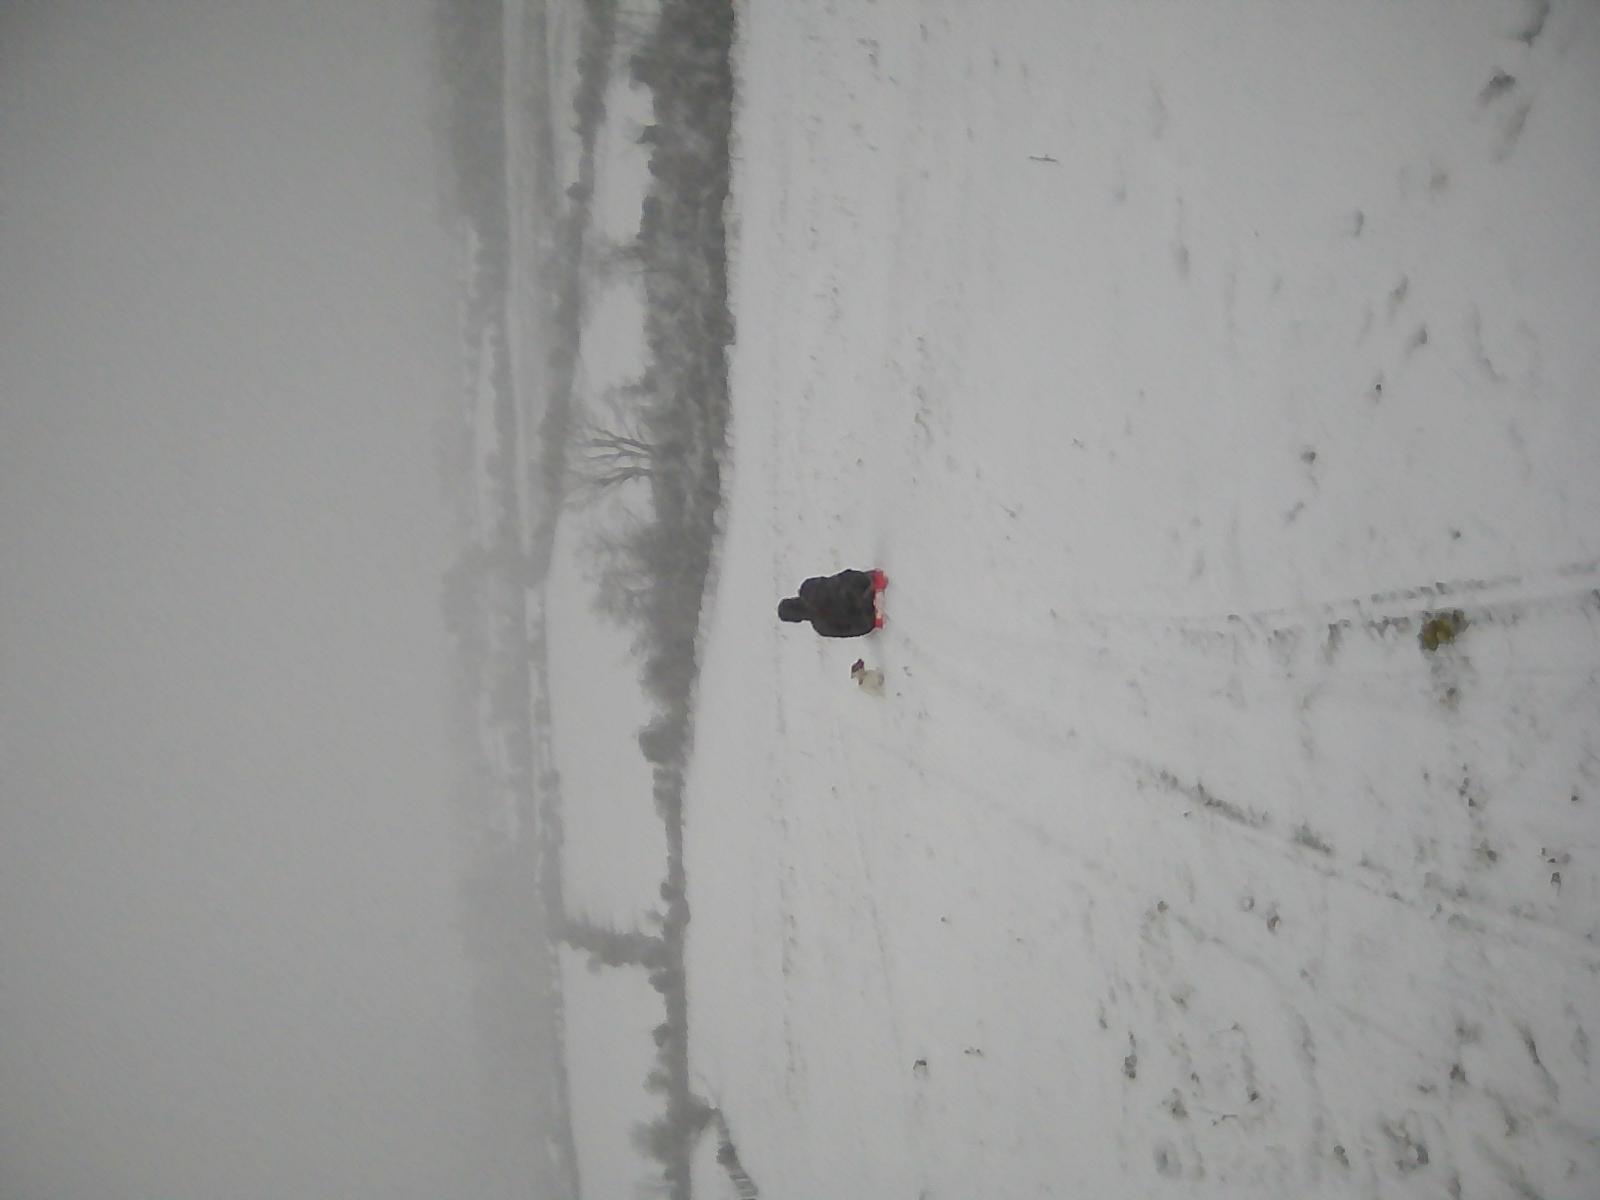 Downhill run Knocksheegowna., Knockanaffrin (Comeragh Mts)